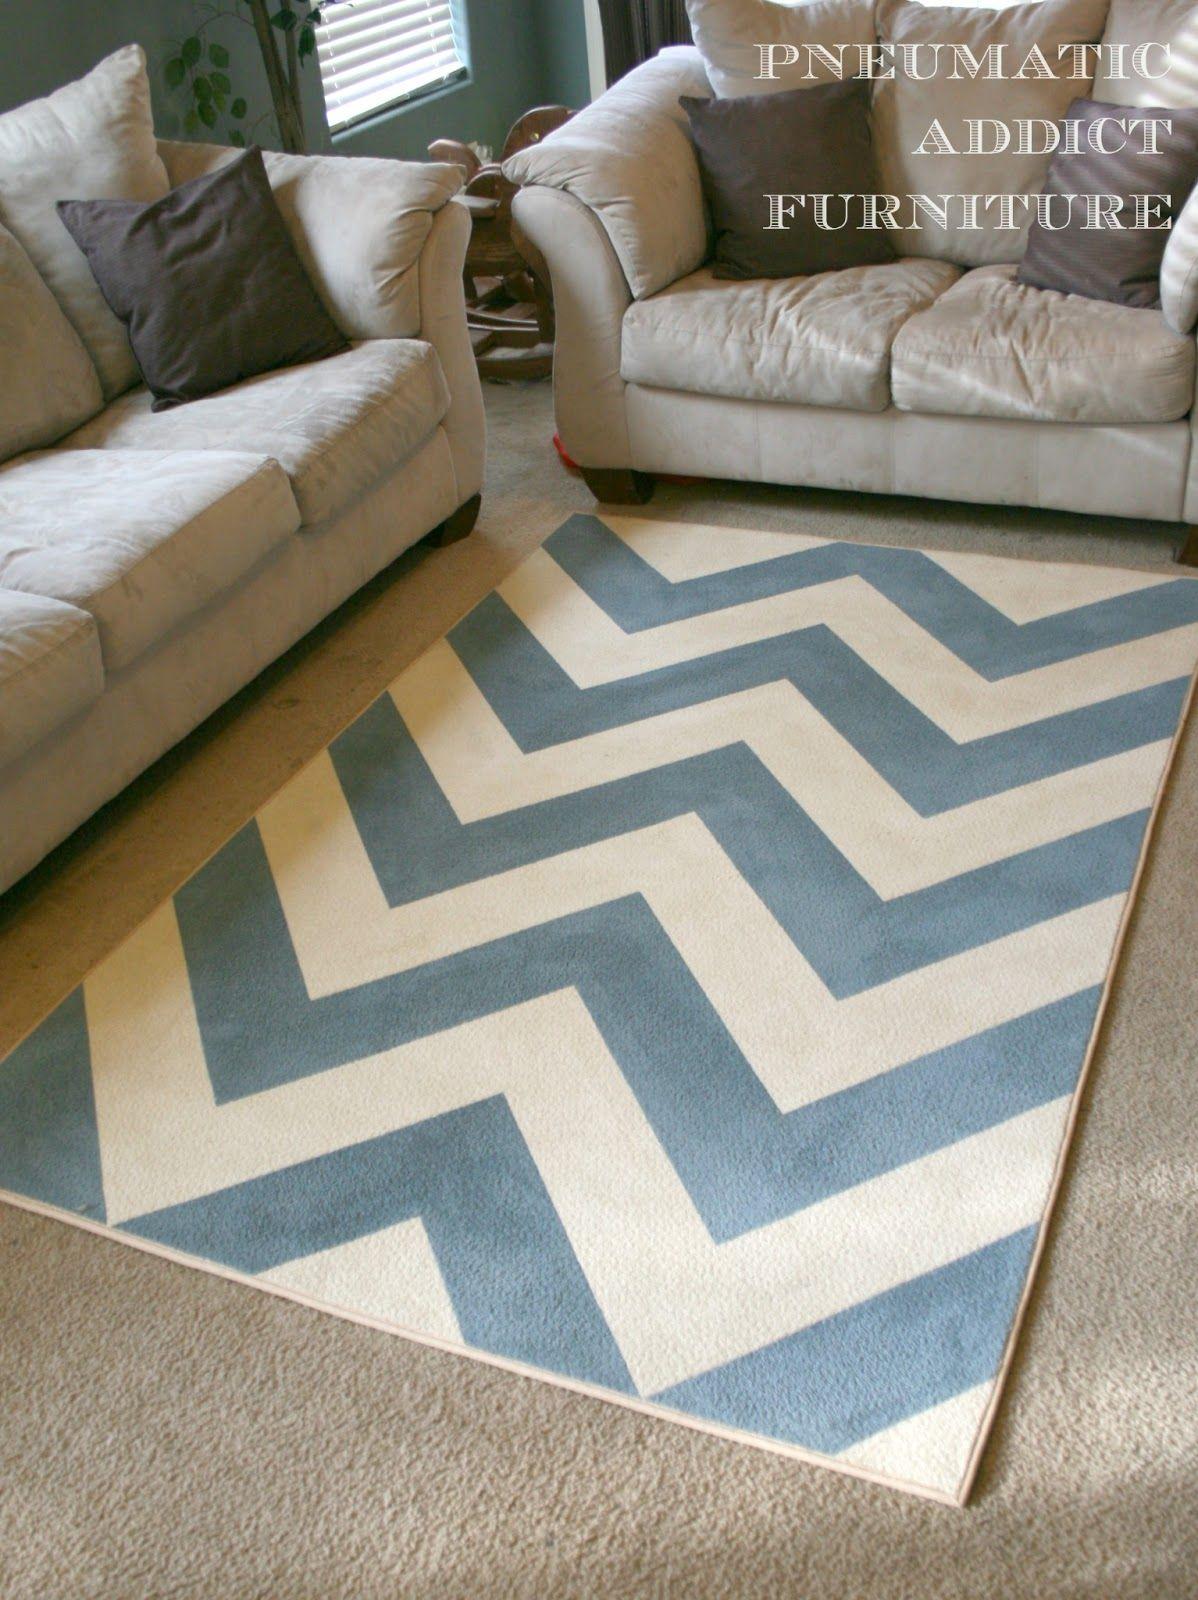 Pneumatic Addict Furniture: DIY Chevron Rug | Diy home ...